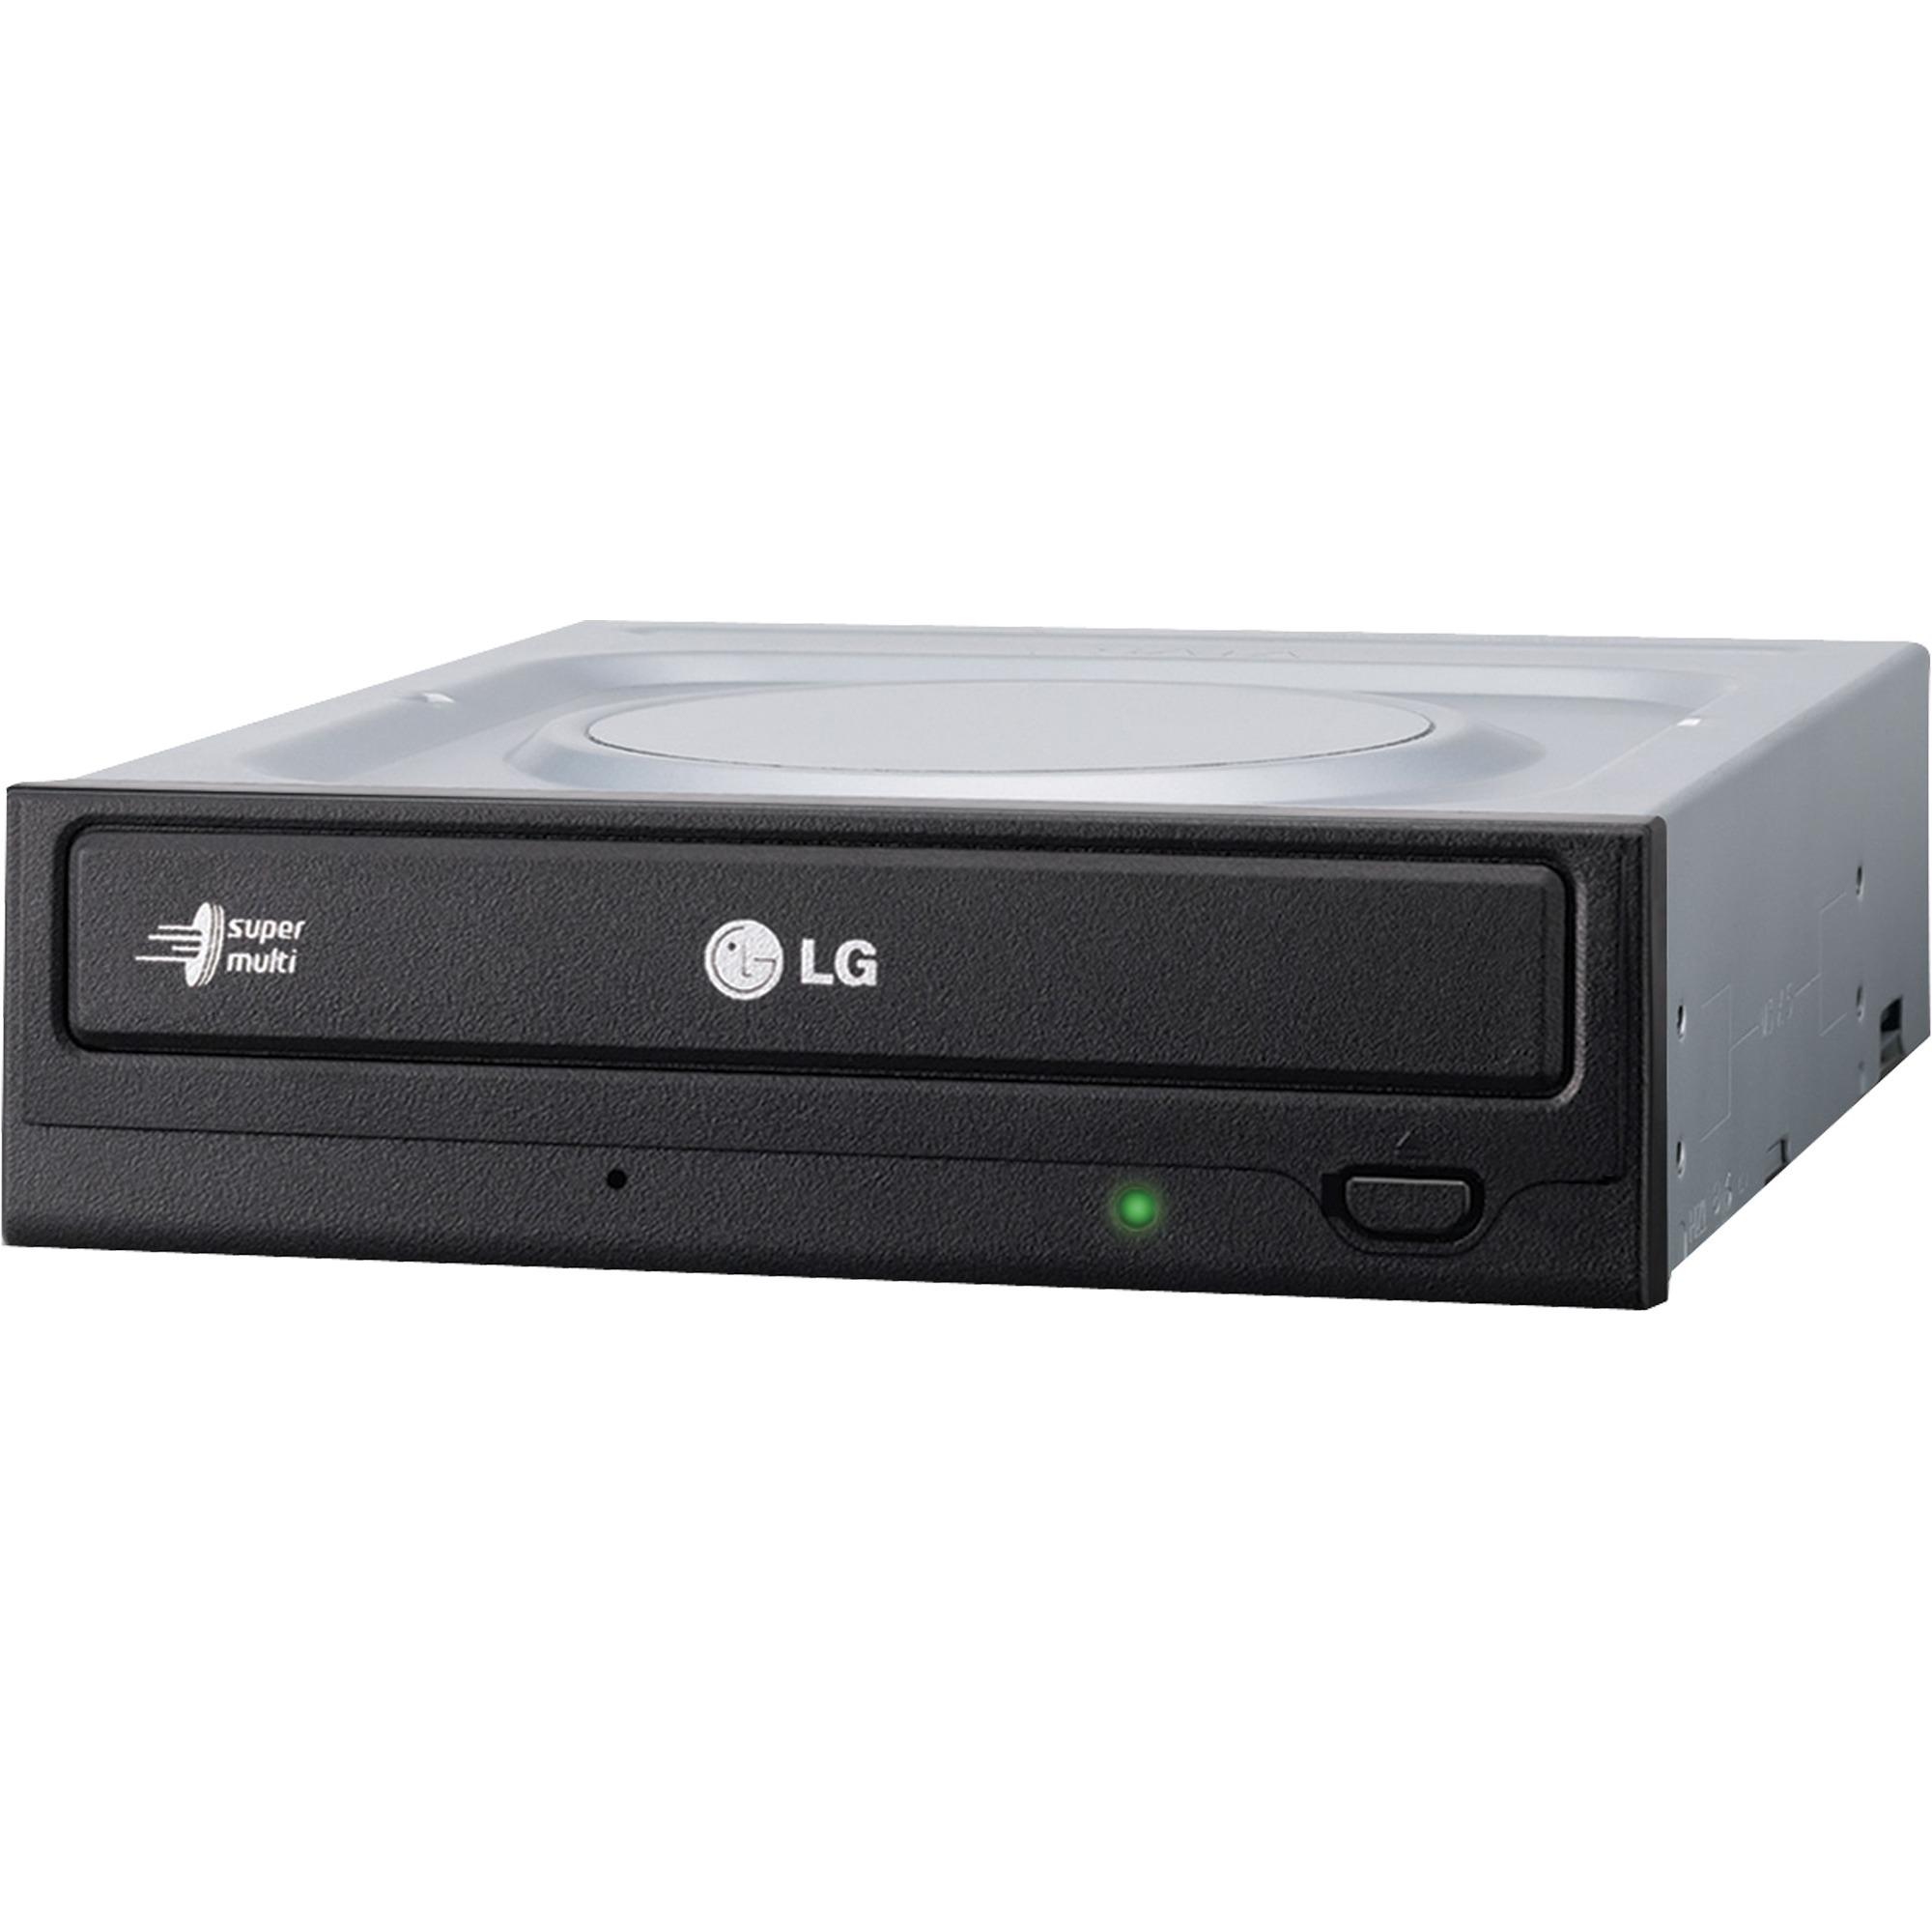 gh24nsd1-intern-dvd-super-multi-dl-sort-optisk-diskdrev-dvd-brander